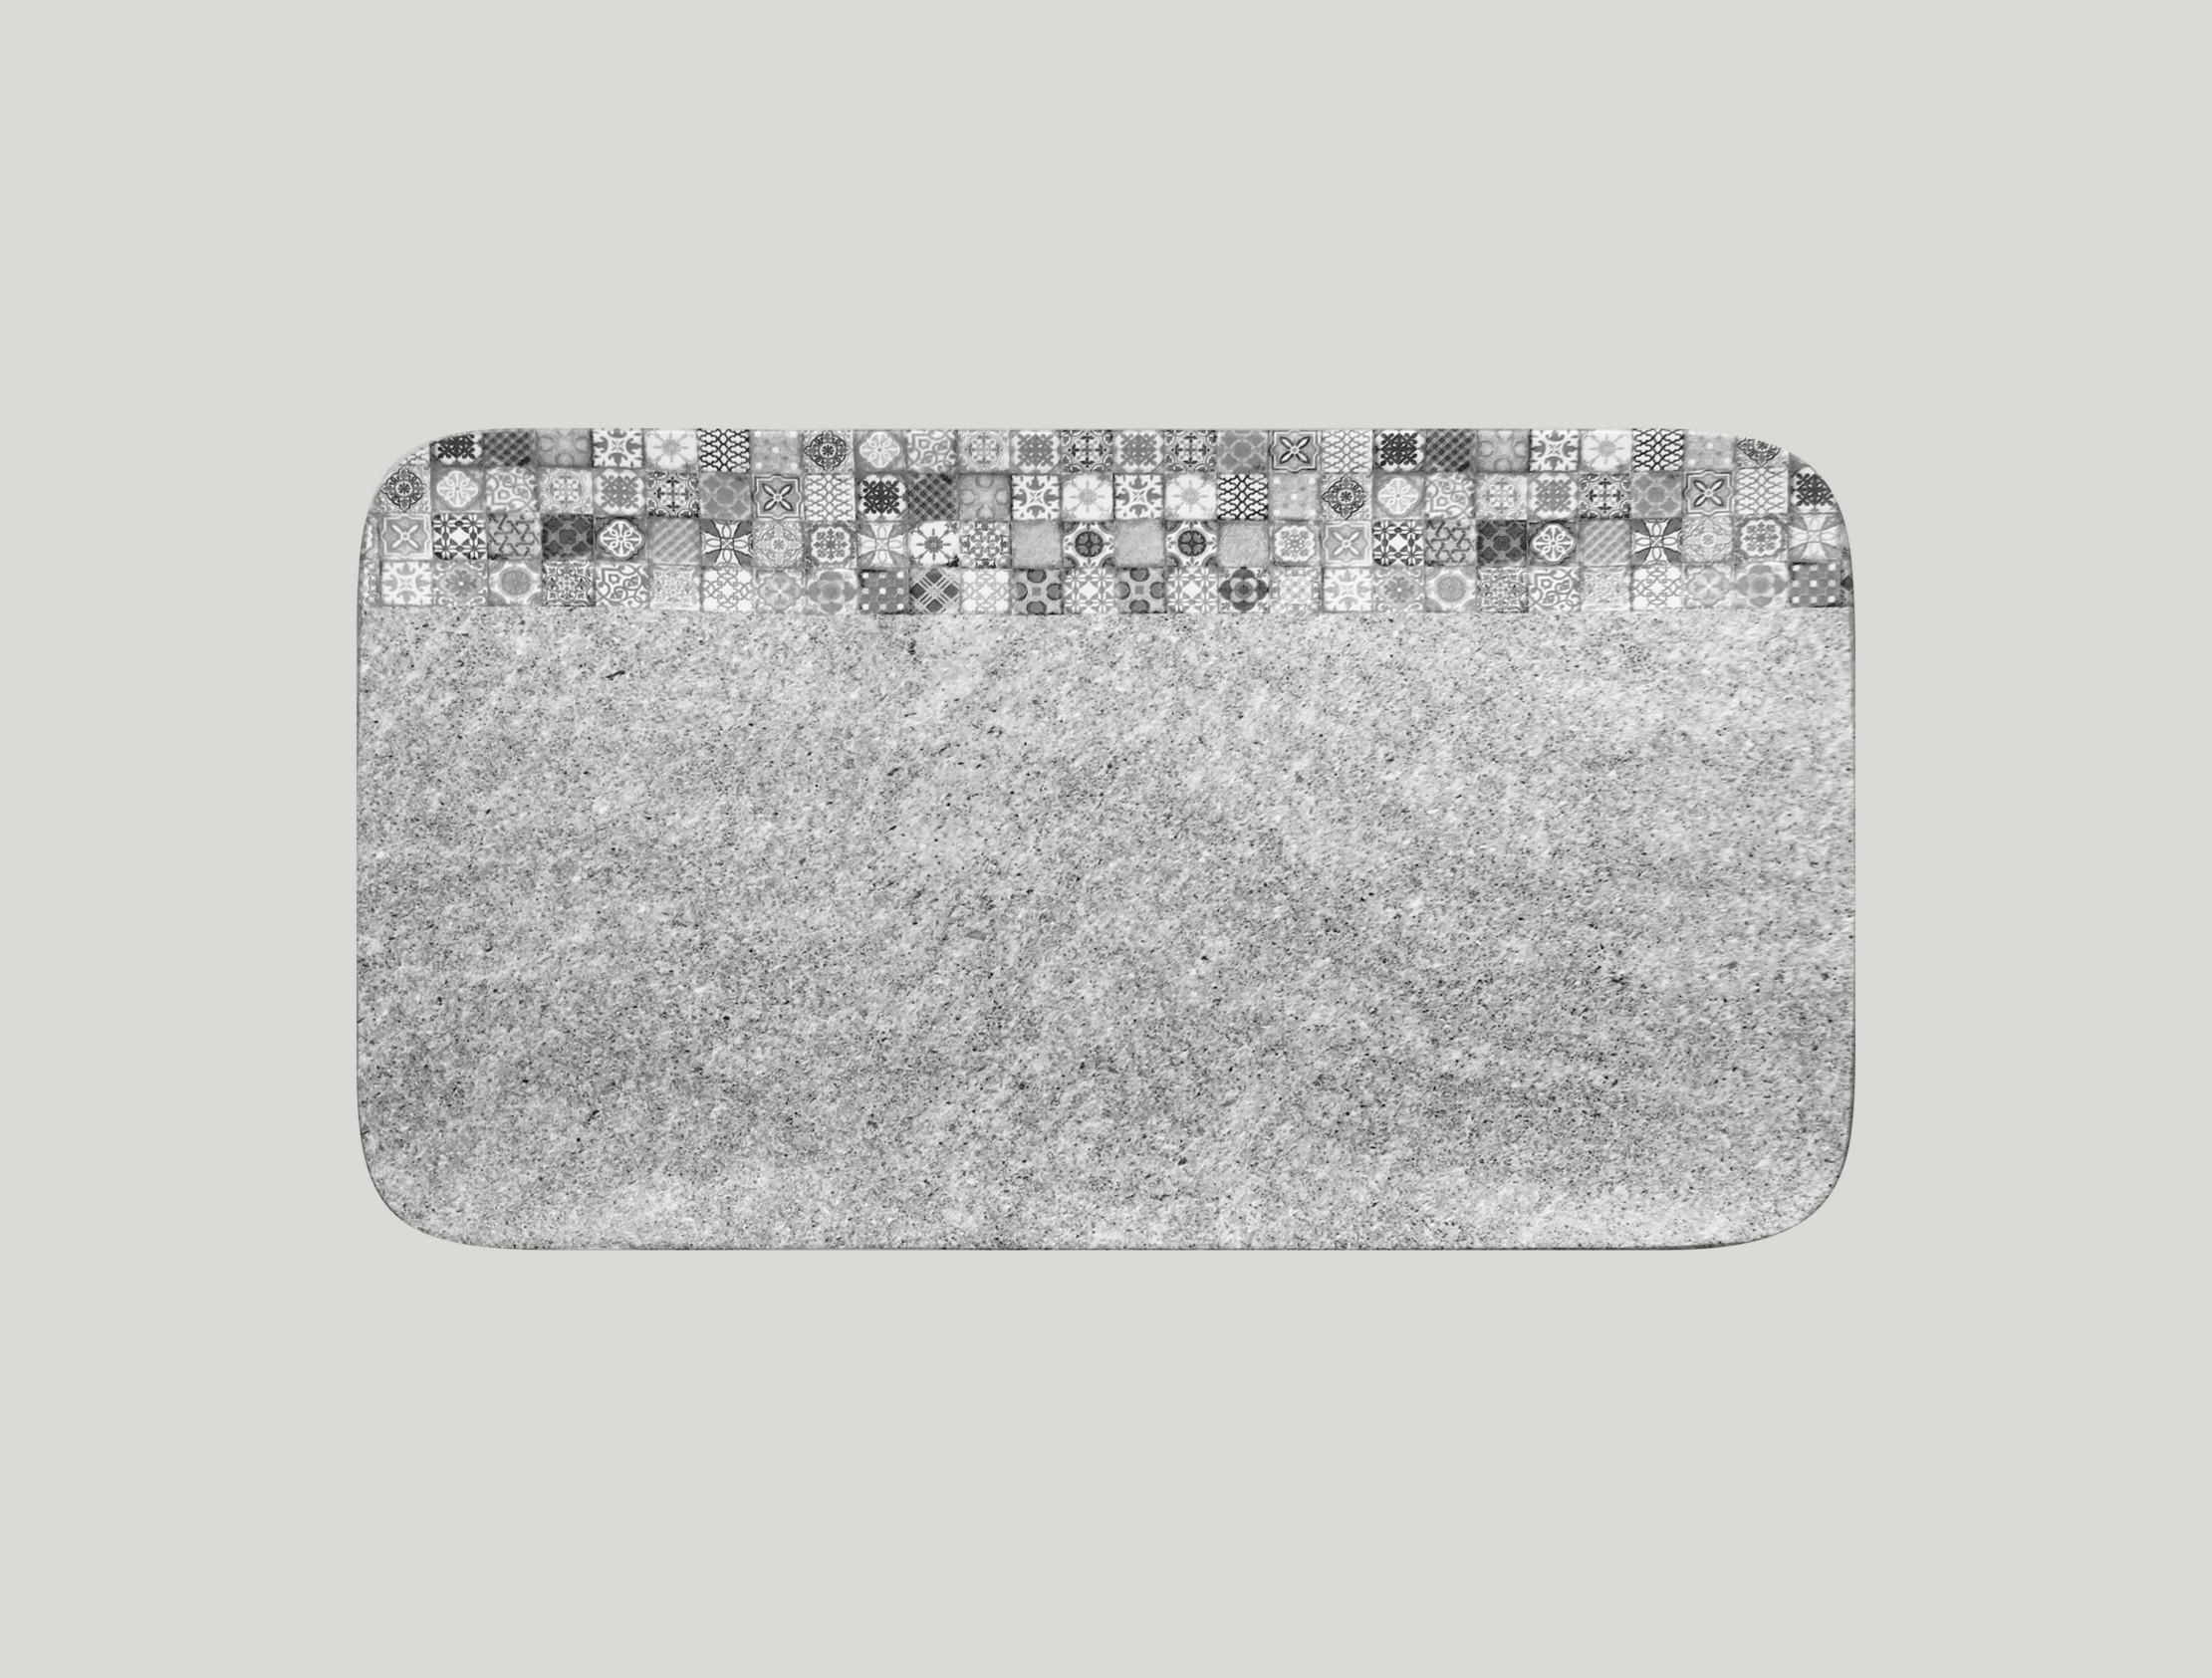 Talíř obdélníkový 38 x 21 cm - šedá